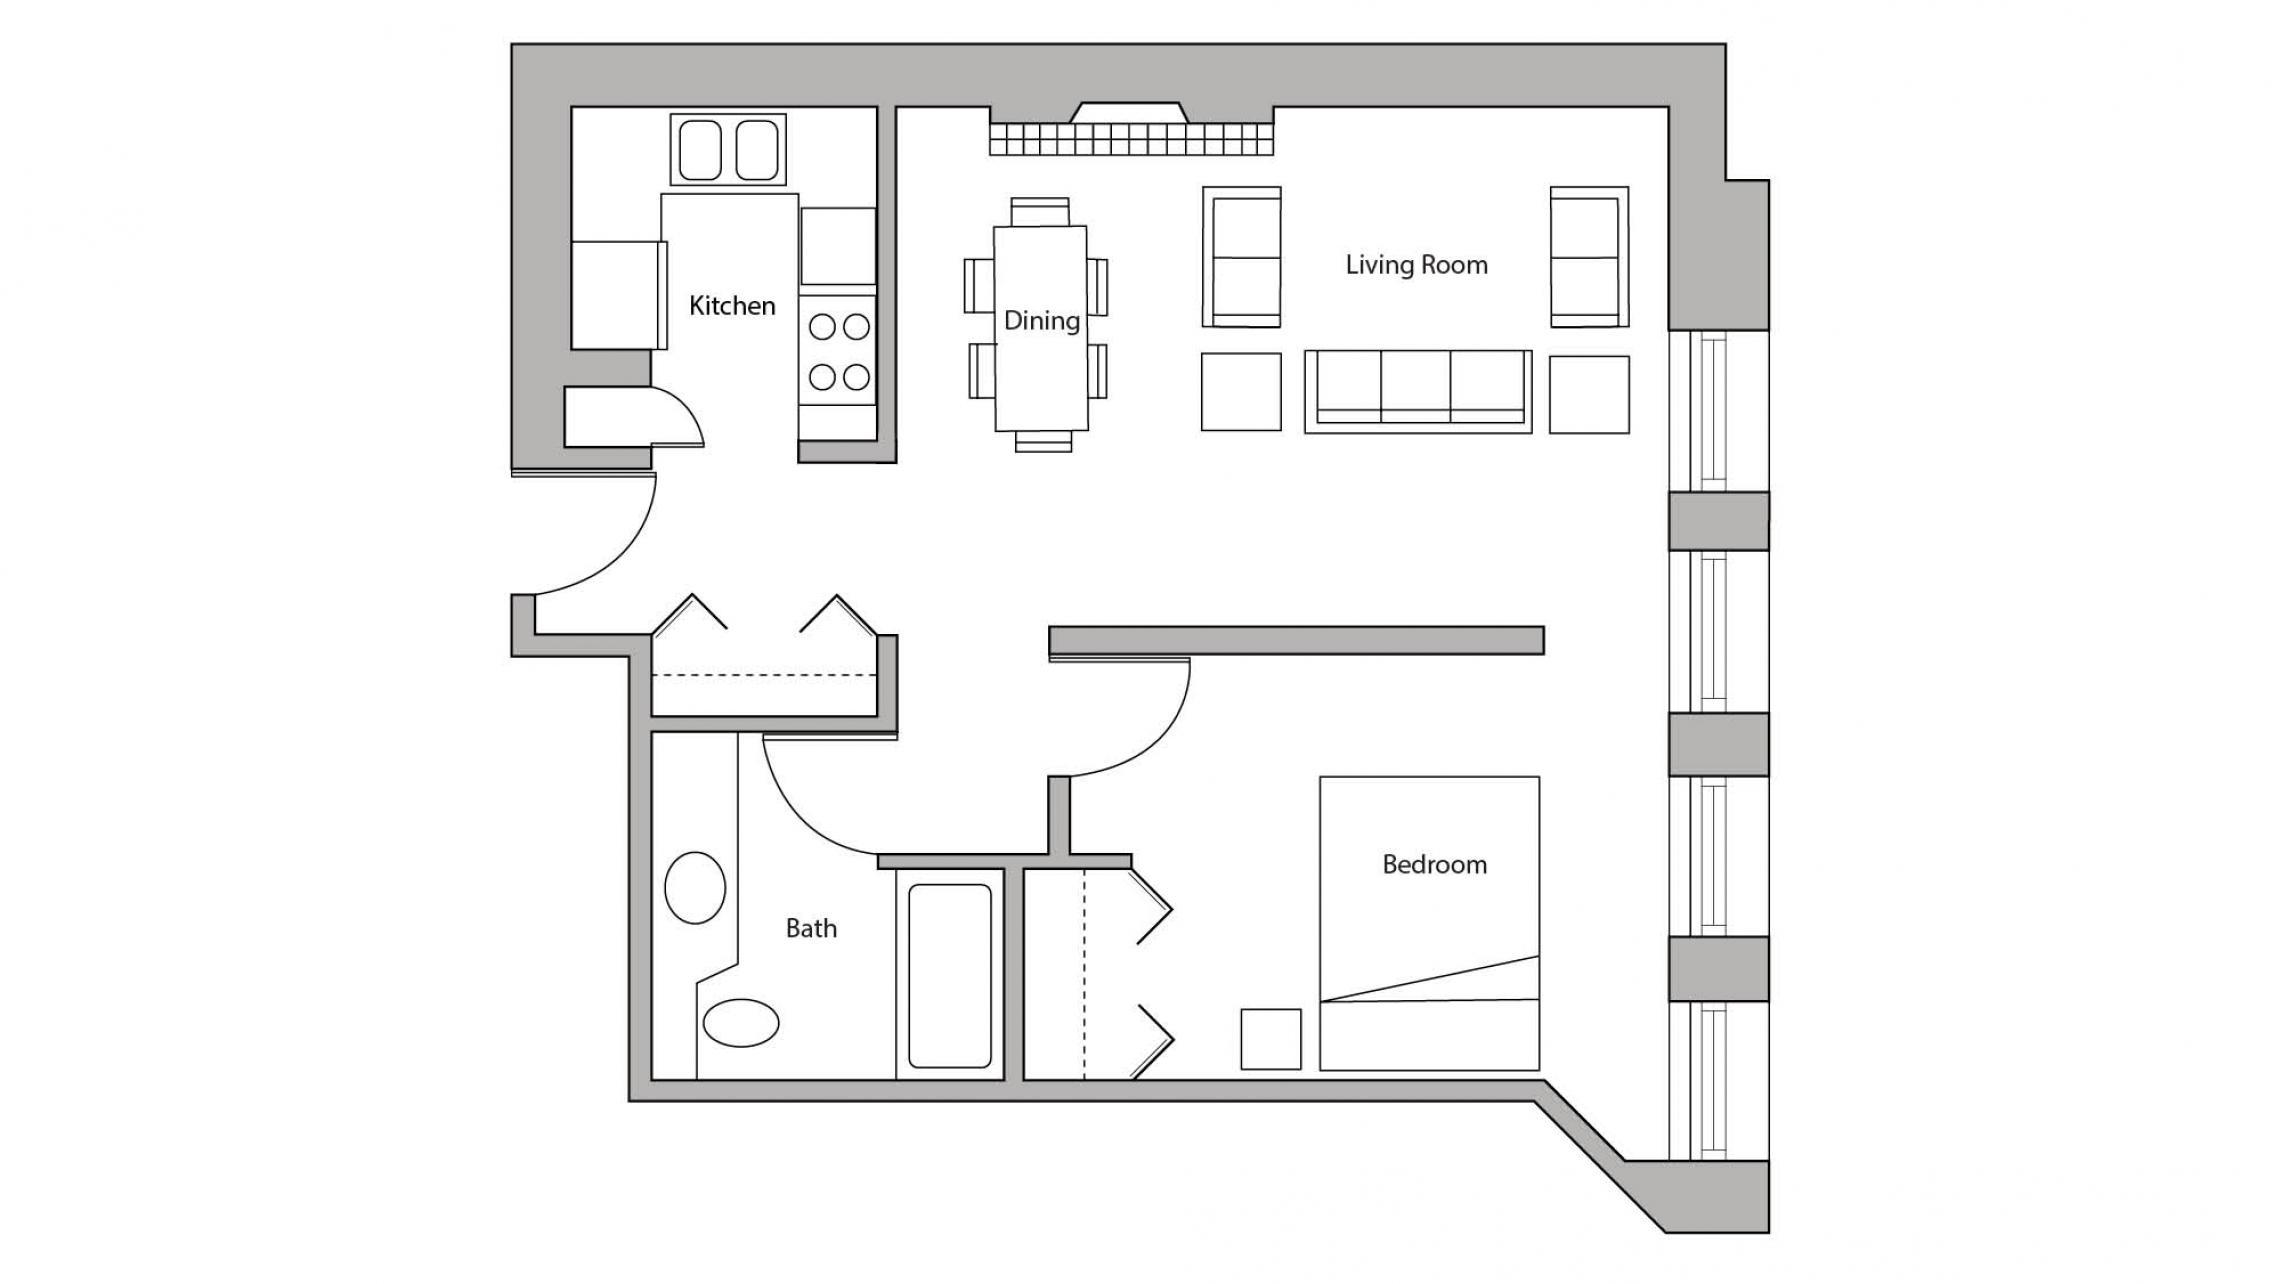 ULI Lincoln School 405 - One Bedroom, One Bathroom